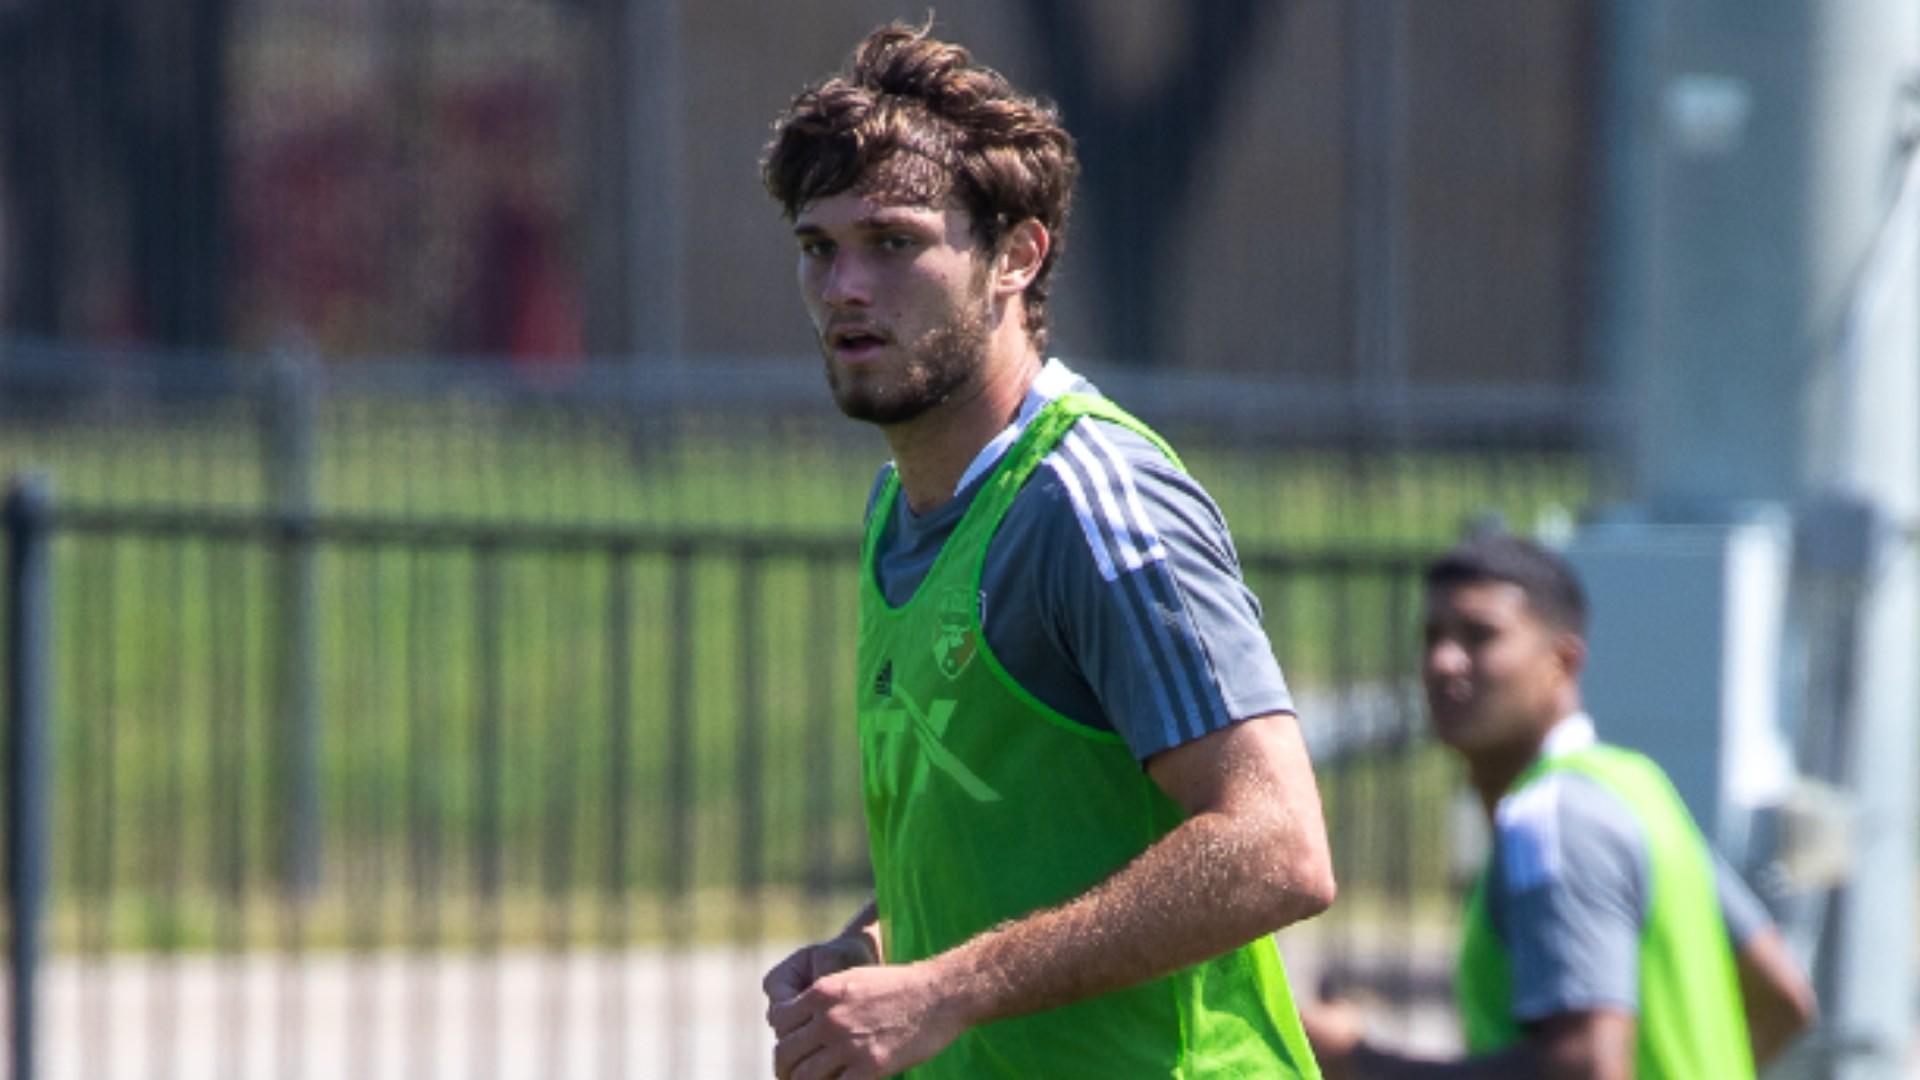 USMNT international Tessmann joins Serie A side Venezia from FC Dallas